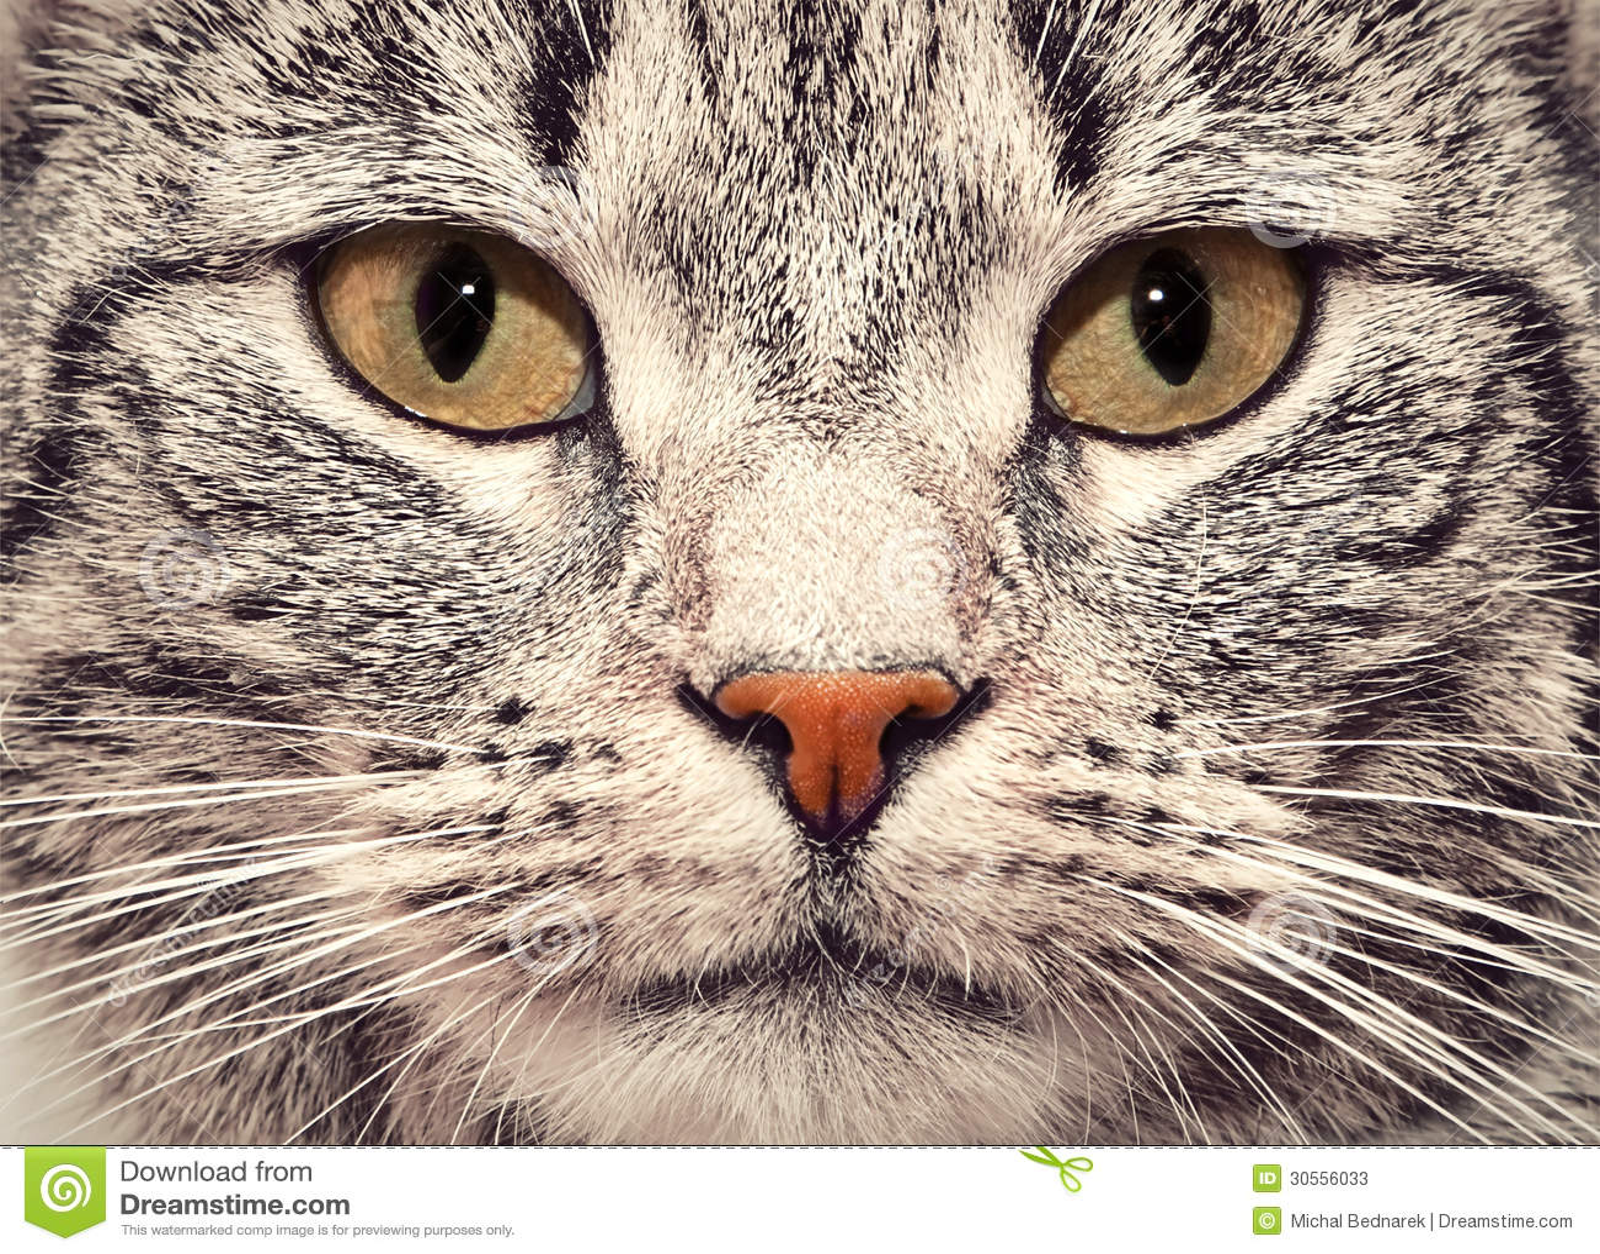 cat face close up portrait stock photos image 30556033. Black Bedroom Furniture Sets. Home Design Ideas